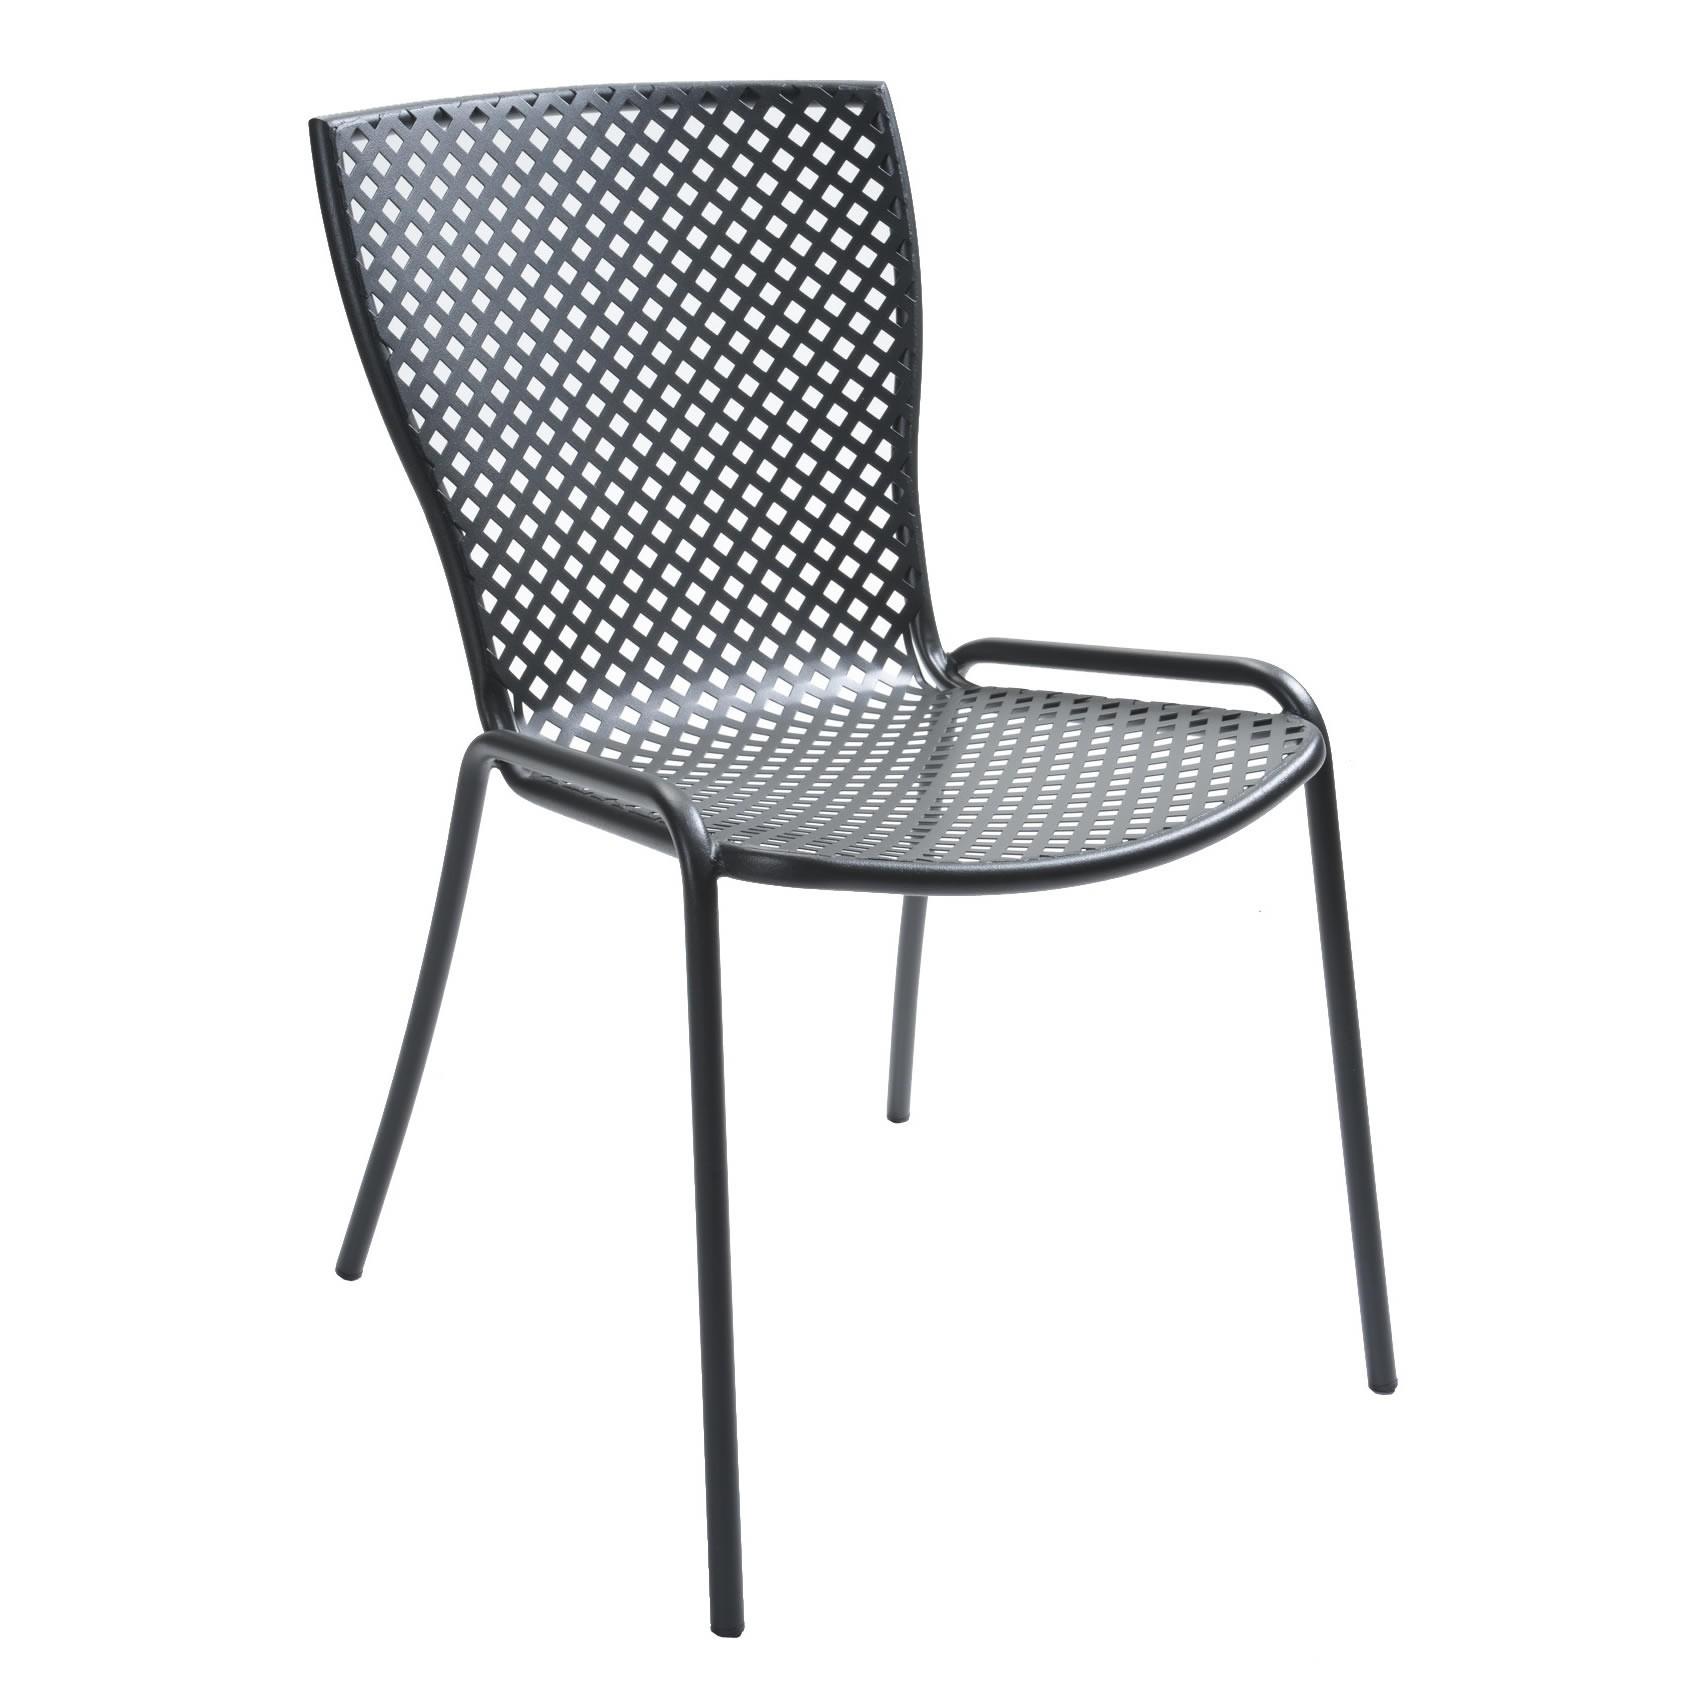 Sedia in acciaio zincato per giardino sonia 1 vendita for Sedie in acciaio